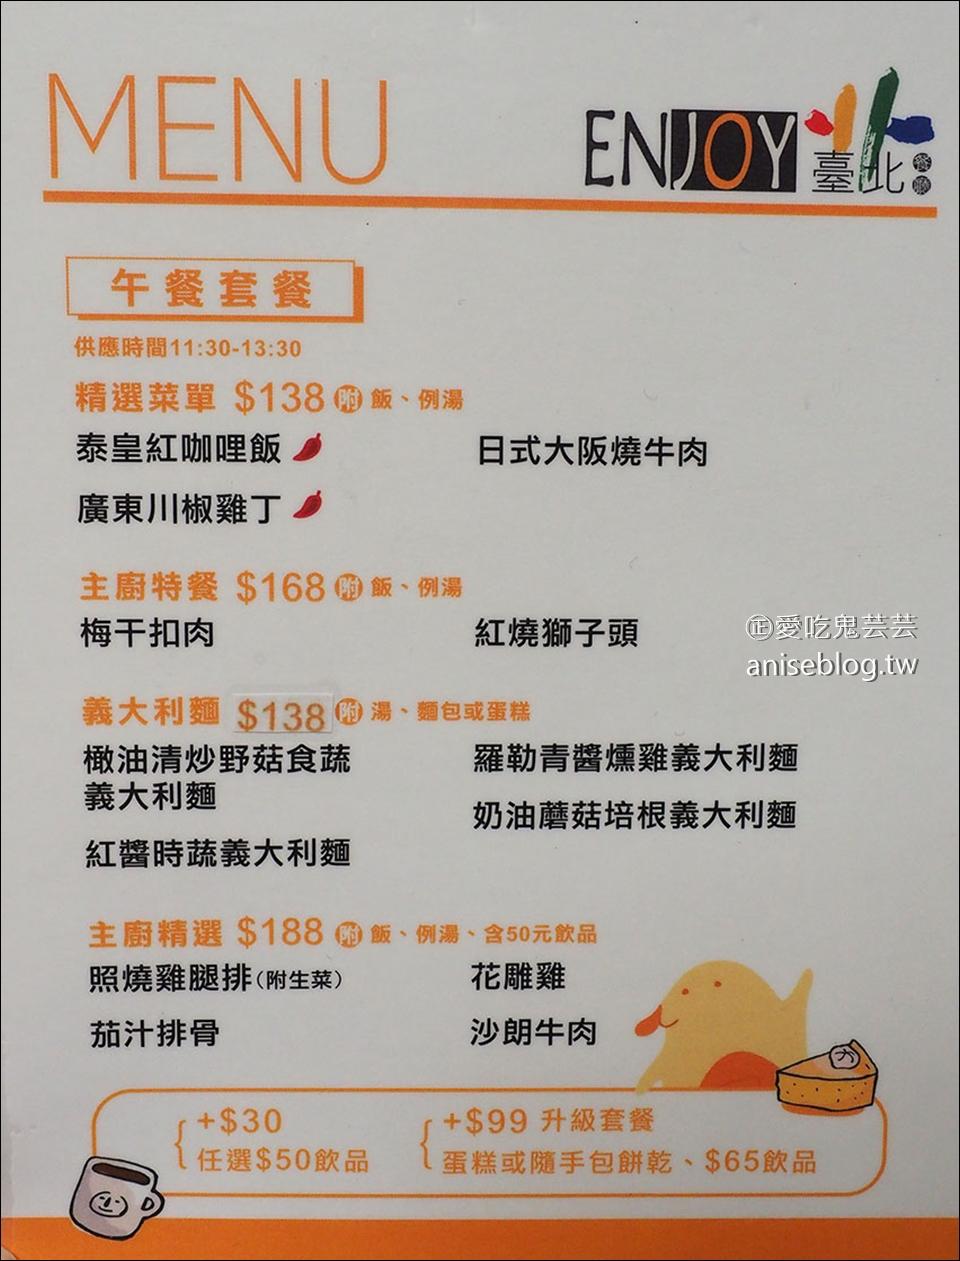 ENJOY臺北餐廳 | 台北市政府內平價咖啡簡餐店(得獎者已抽出)